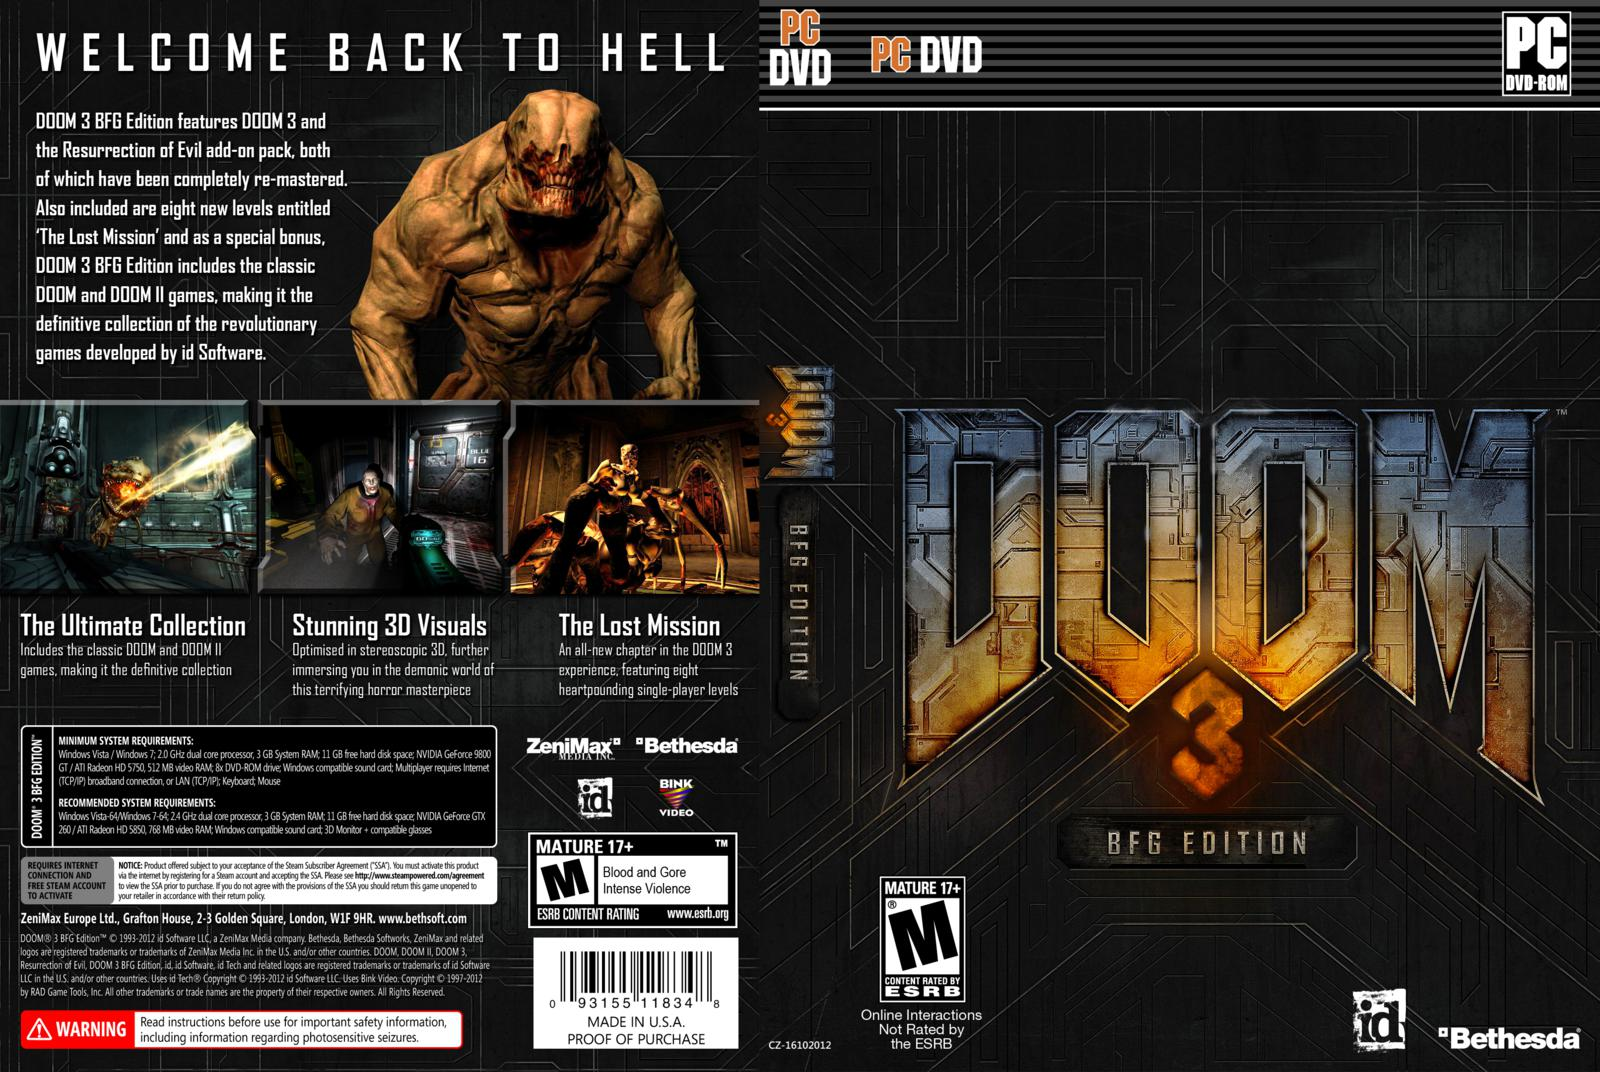 Crack doom 3 bfg edition > Autocad civil 3d keygen